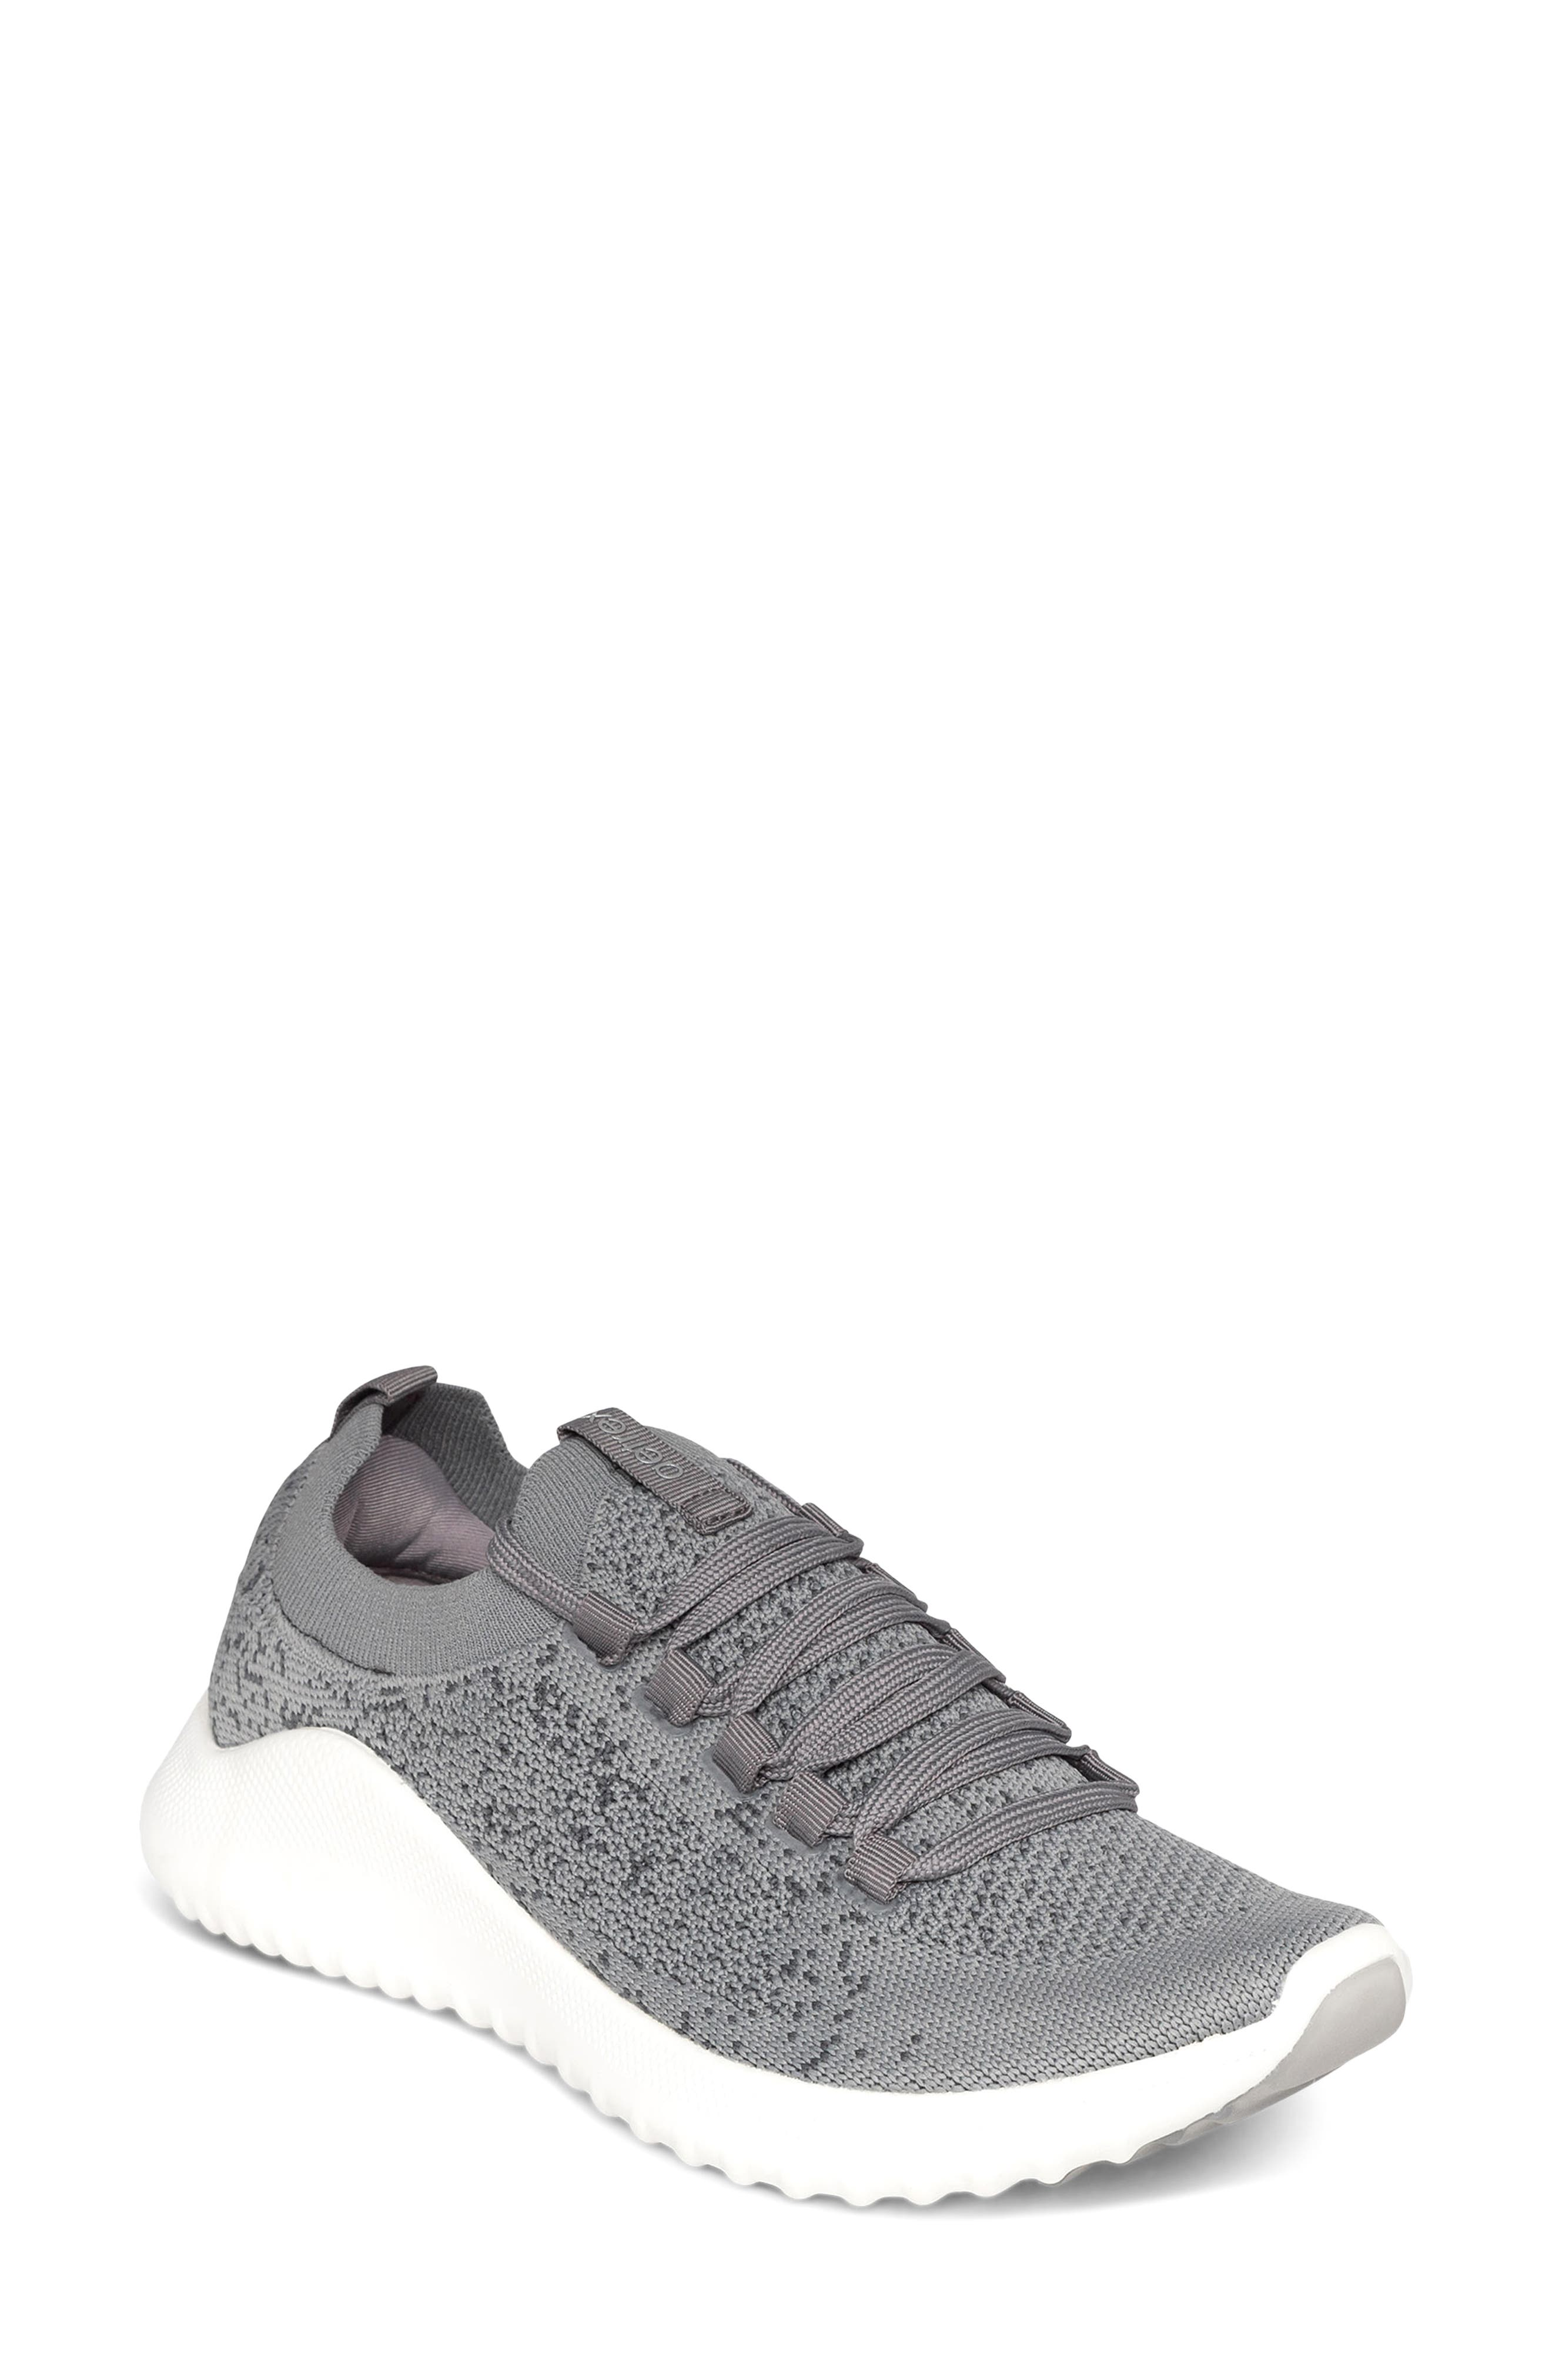 Carly Knit Sneaker